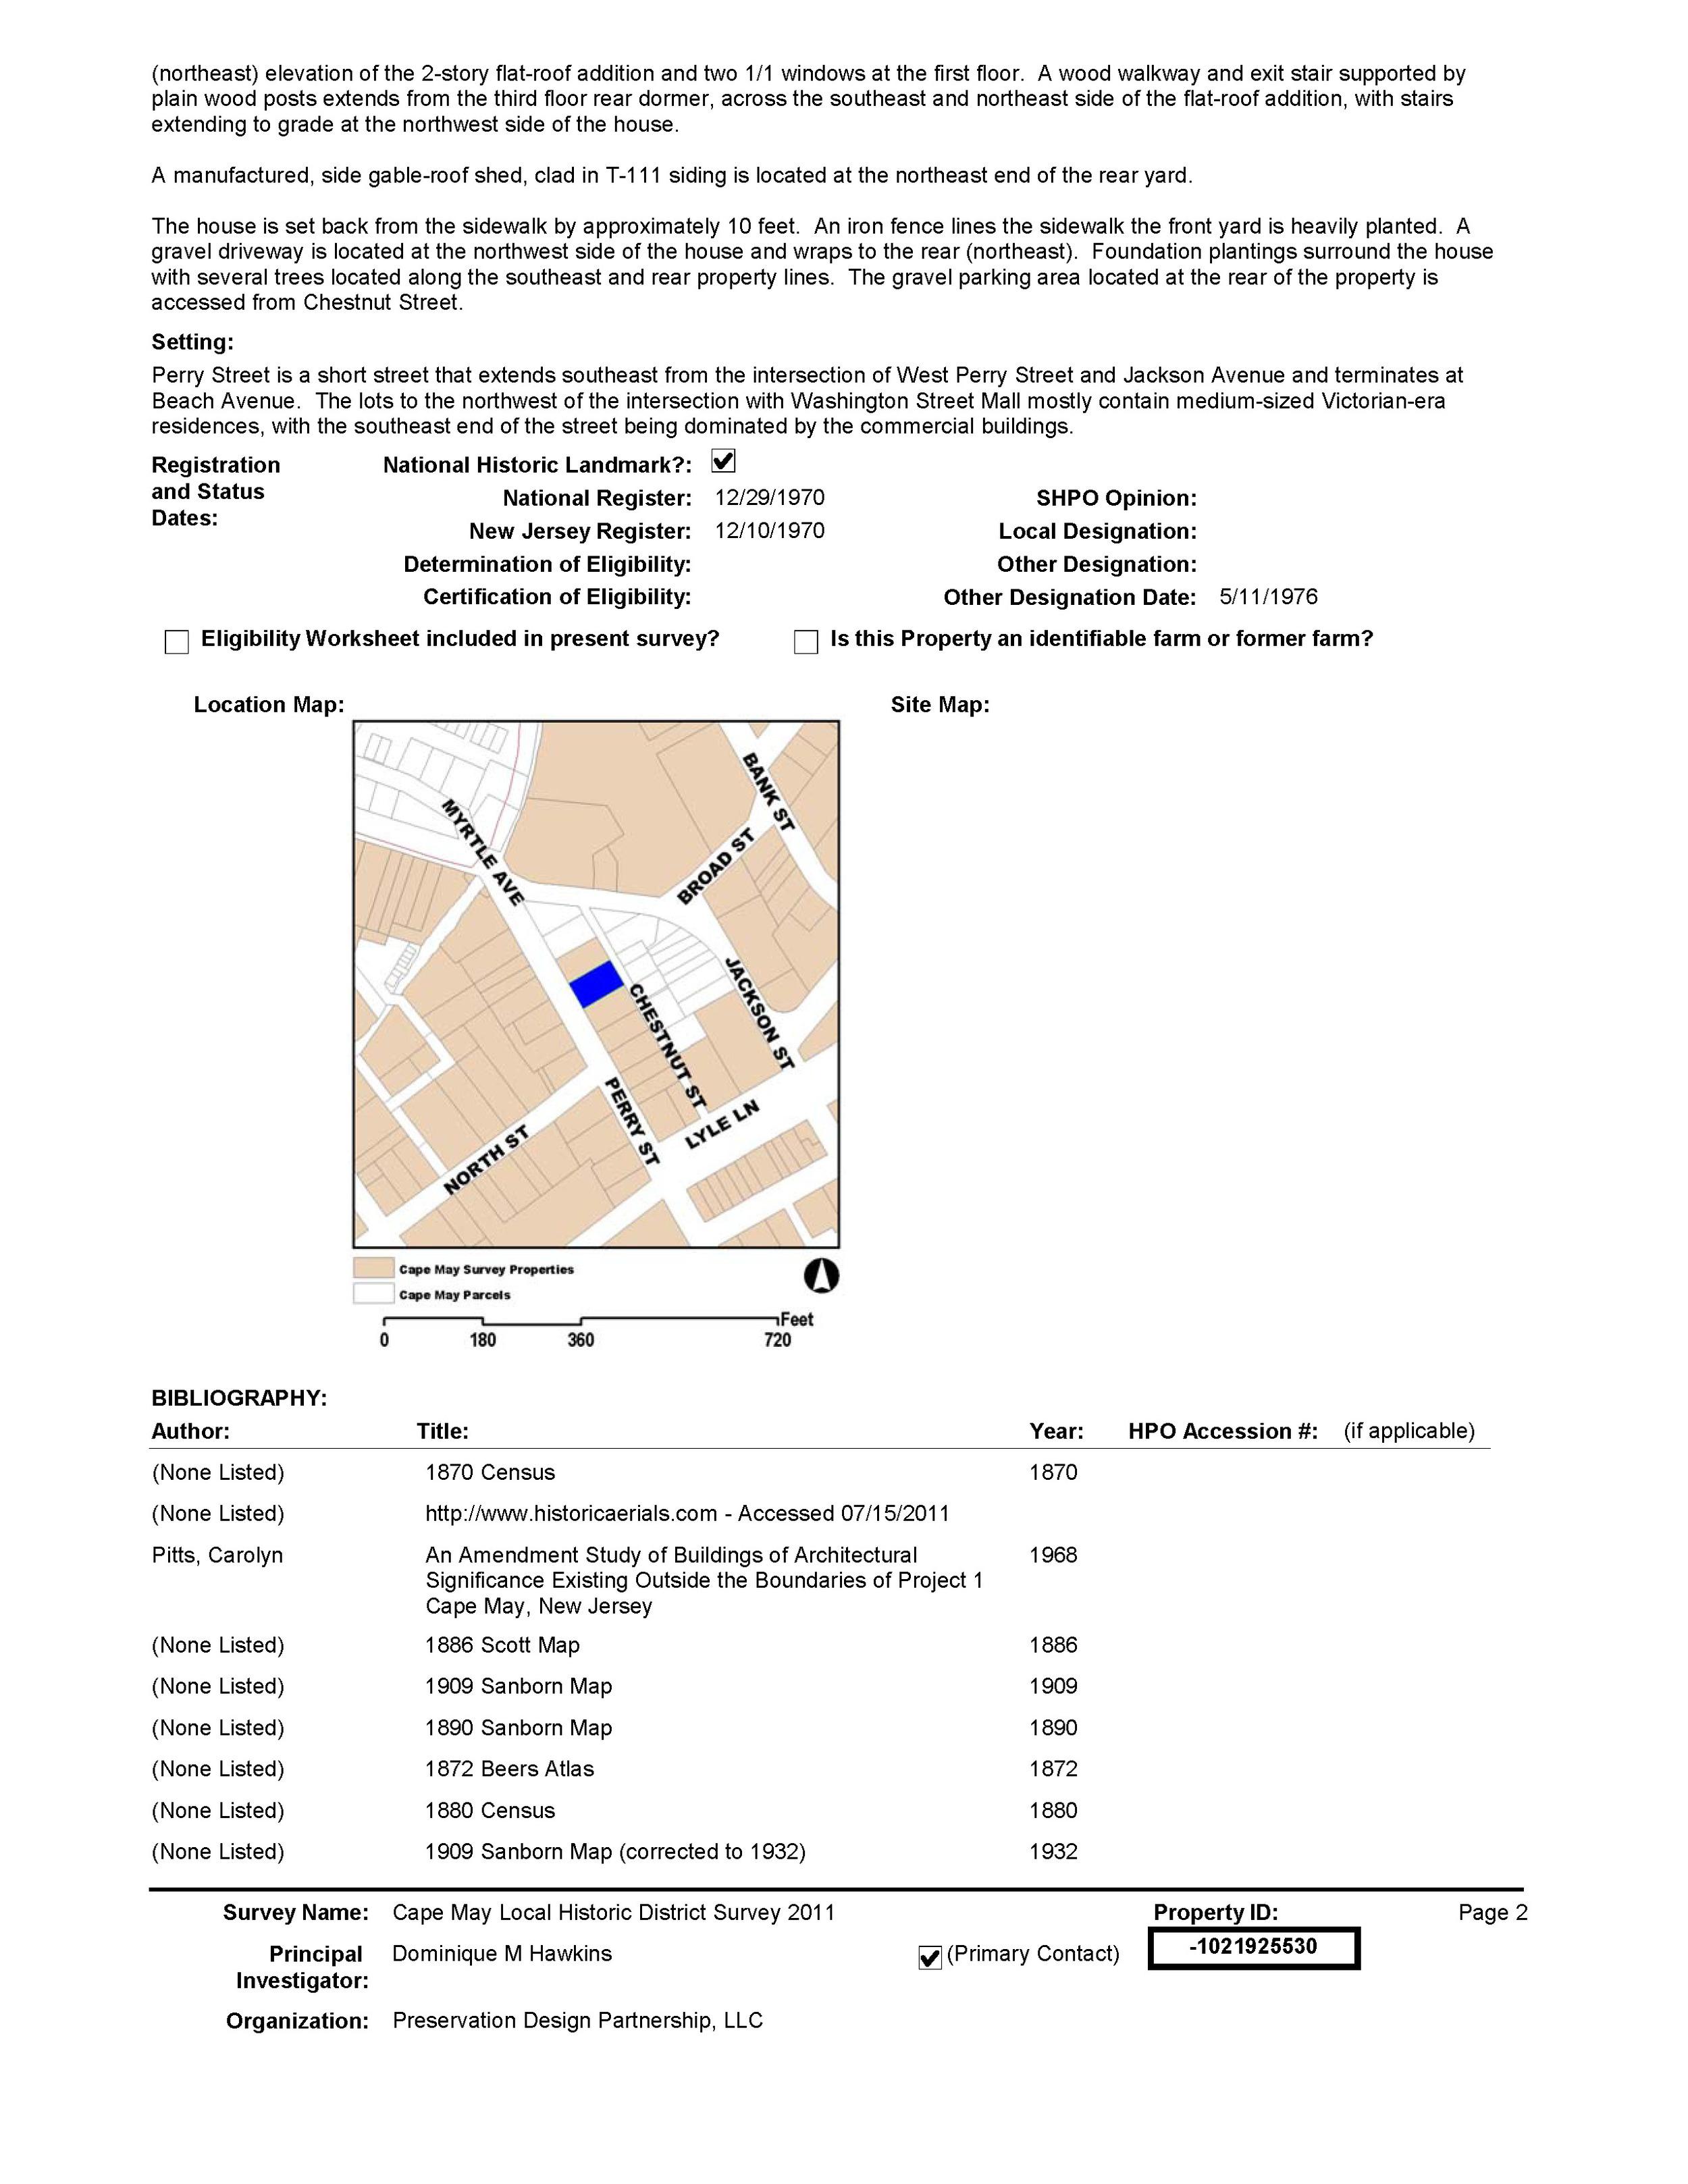 1038_JOSEPH Q WILLIAMS HOUSE [-1021925530]_Page_2.jpg